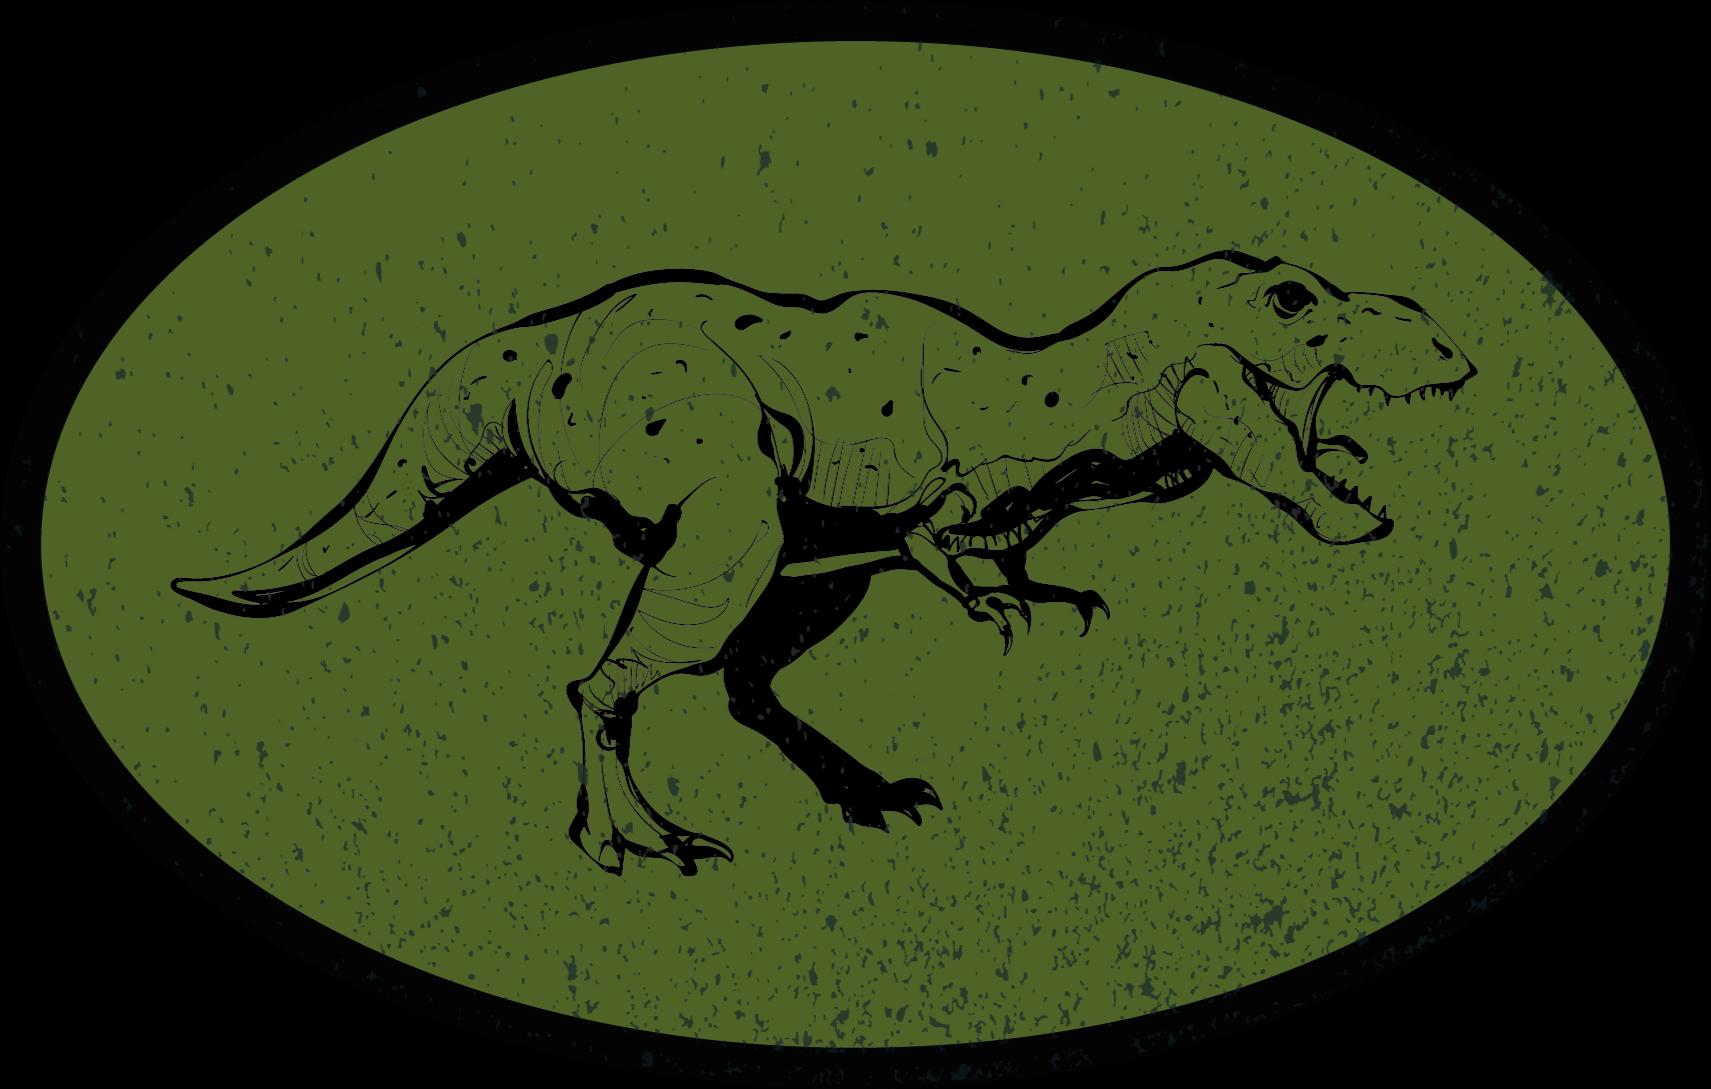 TenStickers. τρομακτικό χαλί τιράννοσαυρου rex. ένα αποκλειστικό αυθεντικό χαλί βινυλίου που θα κάνει το παιδί σας εξαιρετικά χαρούμενο με το νέο εξατομικευμένο χαλί βινυλίου! κατοίκον διανομή!